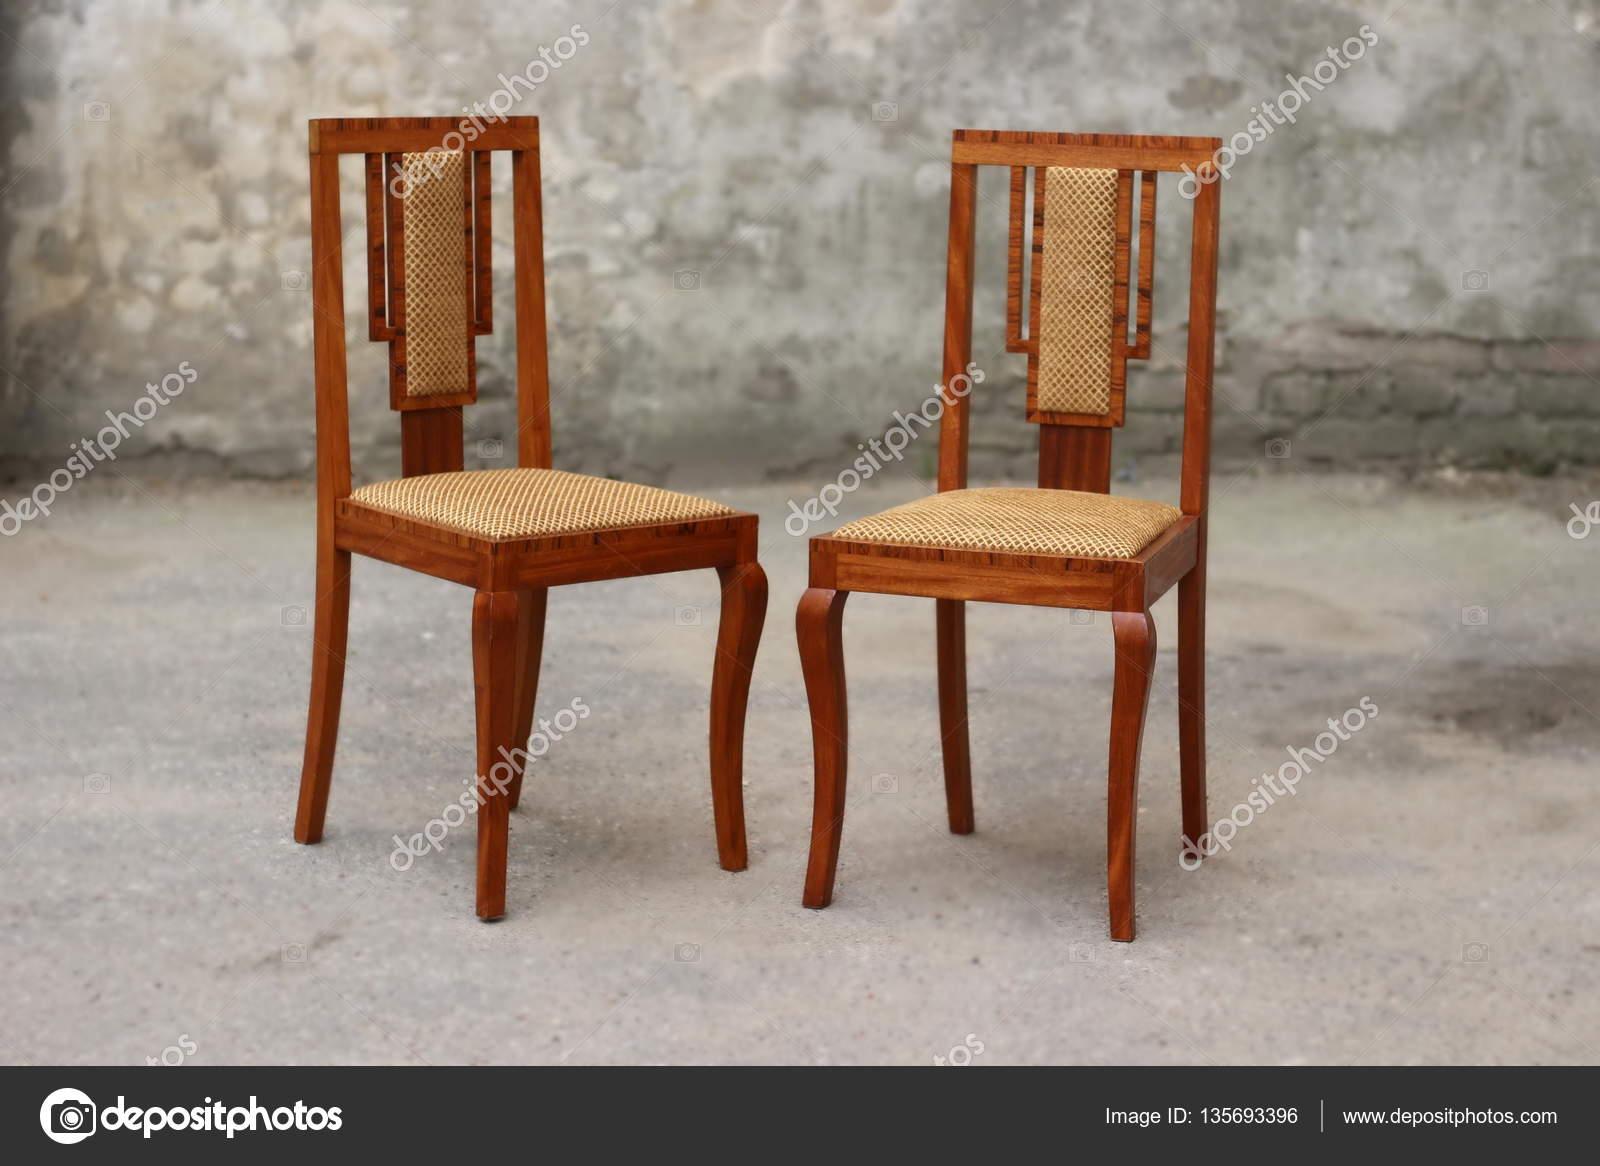 vintage art deco furniture. Old Art Deco Chair \u2014 Stock Photo Vintage Furniture